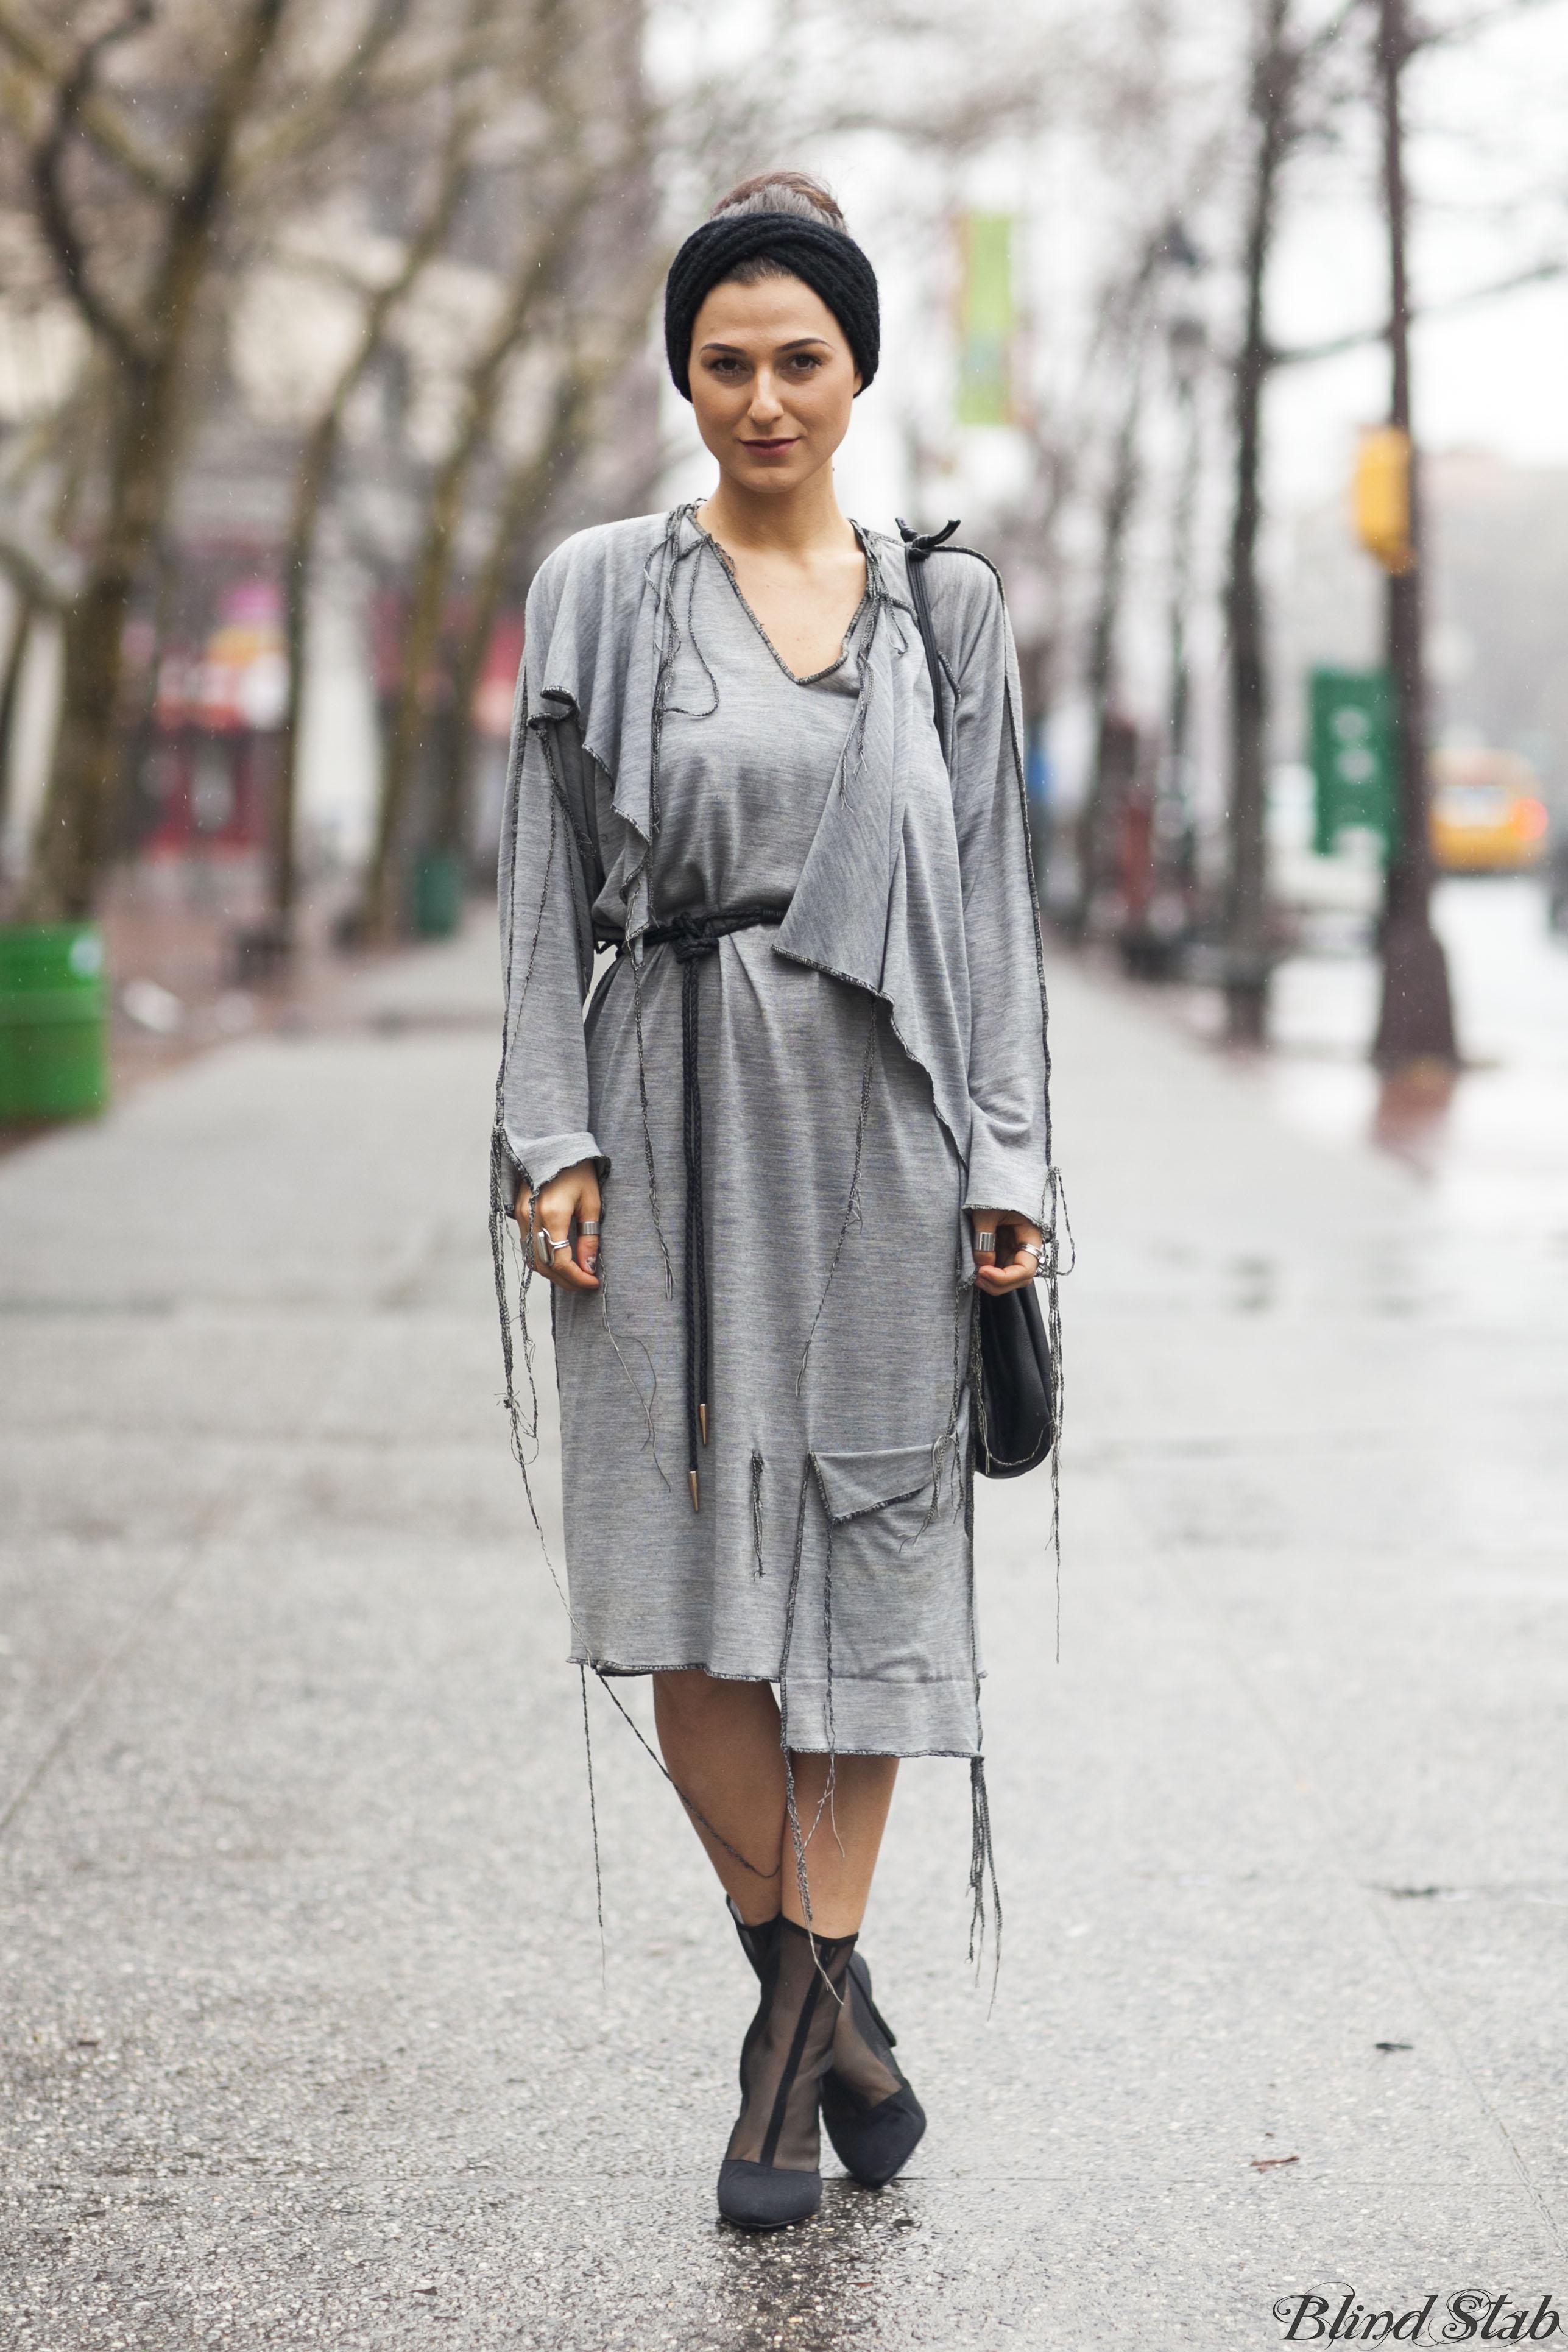 Gray-Shredded-Torn-Dress-NYC-Street-Style-Winter-Headband-Mesh-Heels